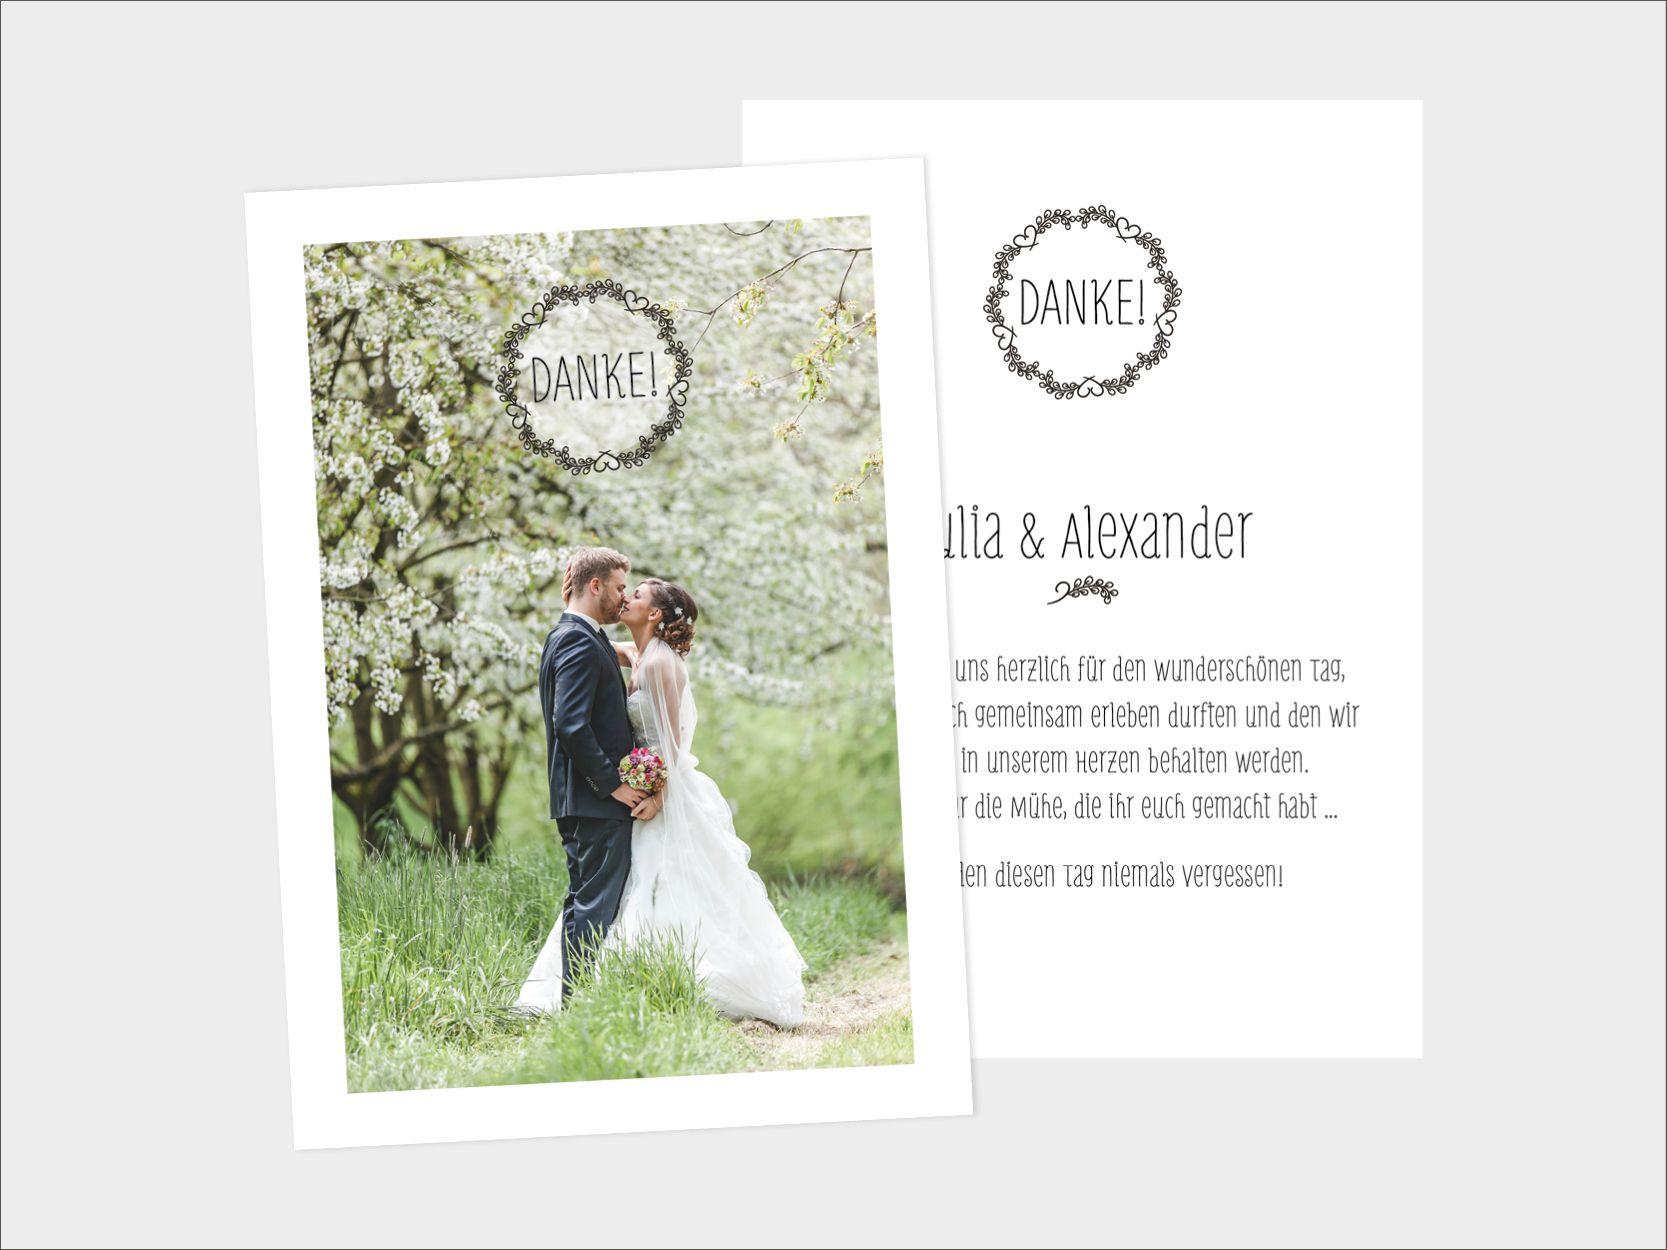 Danksagungskarte Designfeder Lieblingsdesigns Danksagung Karte Hochzeit Dankekarte Hochzeit Dankeskarte Hochzeit Danksagungskarten Hochzeit